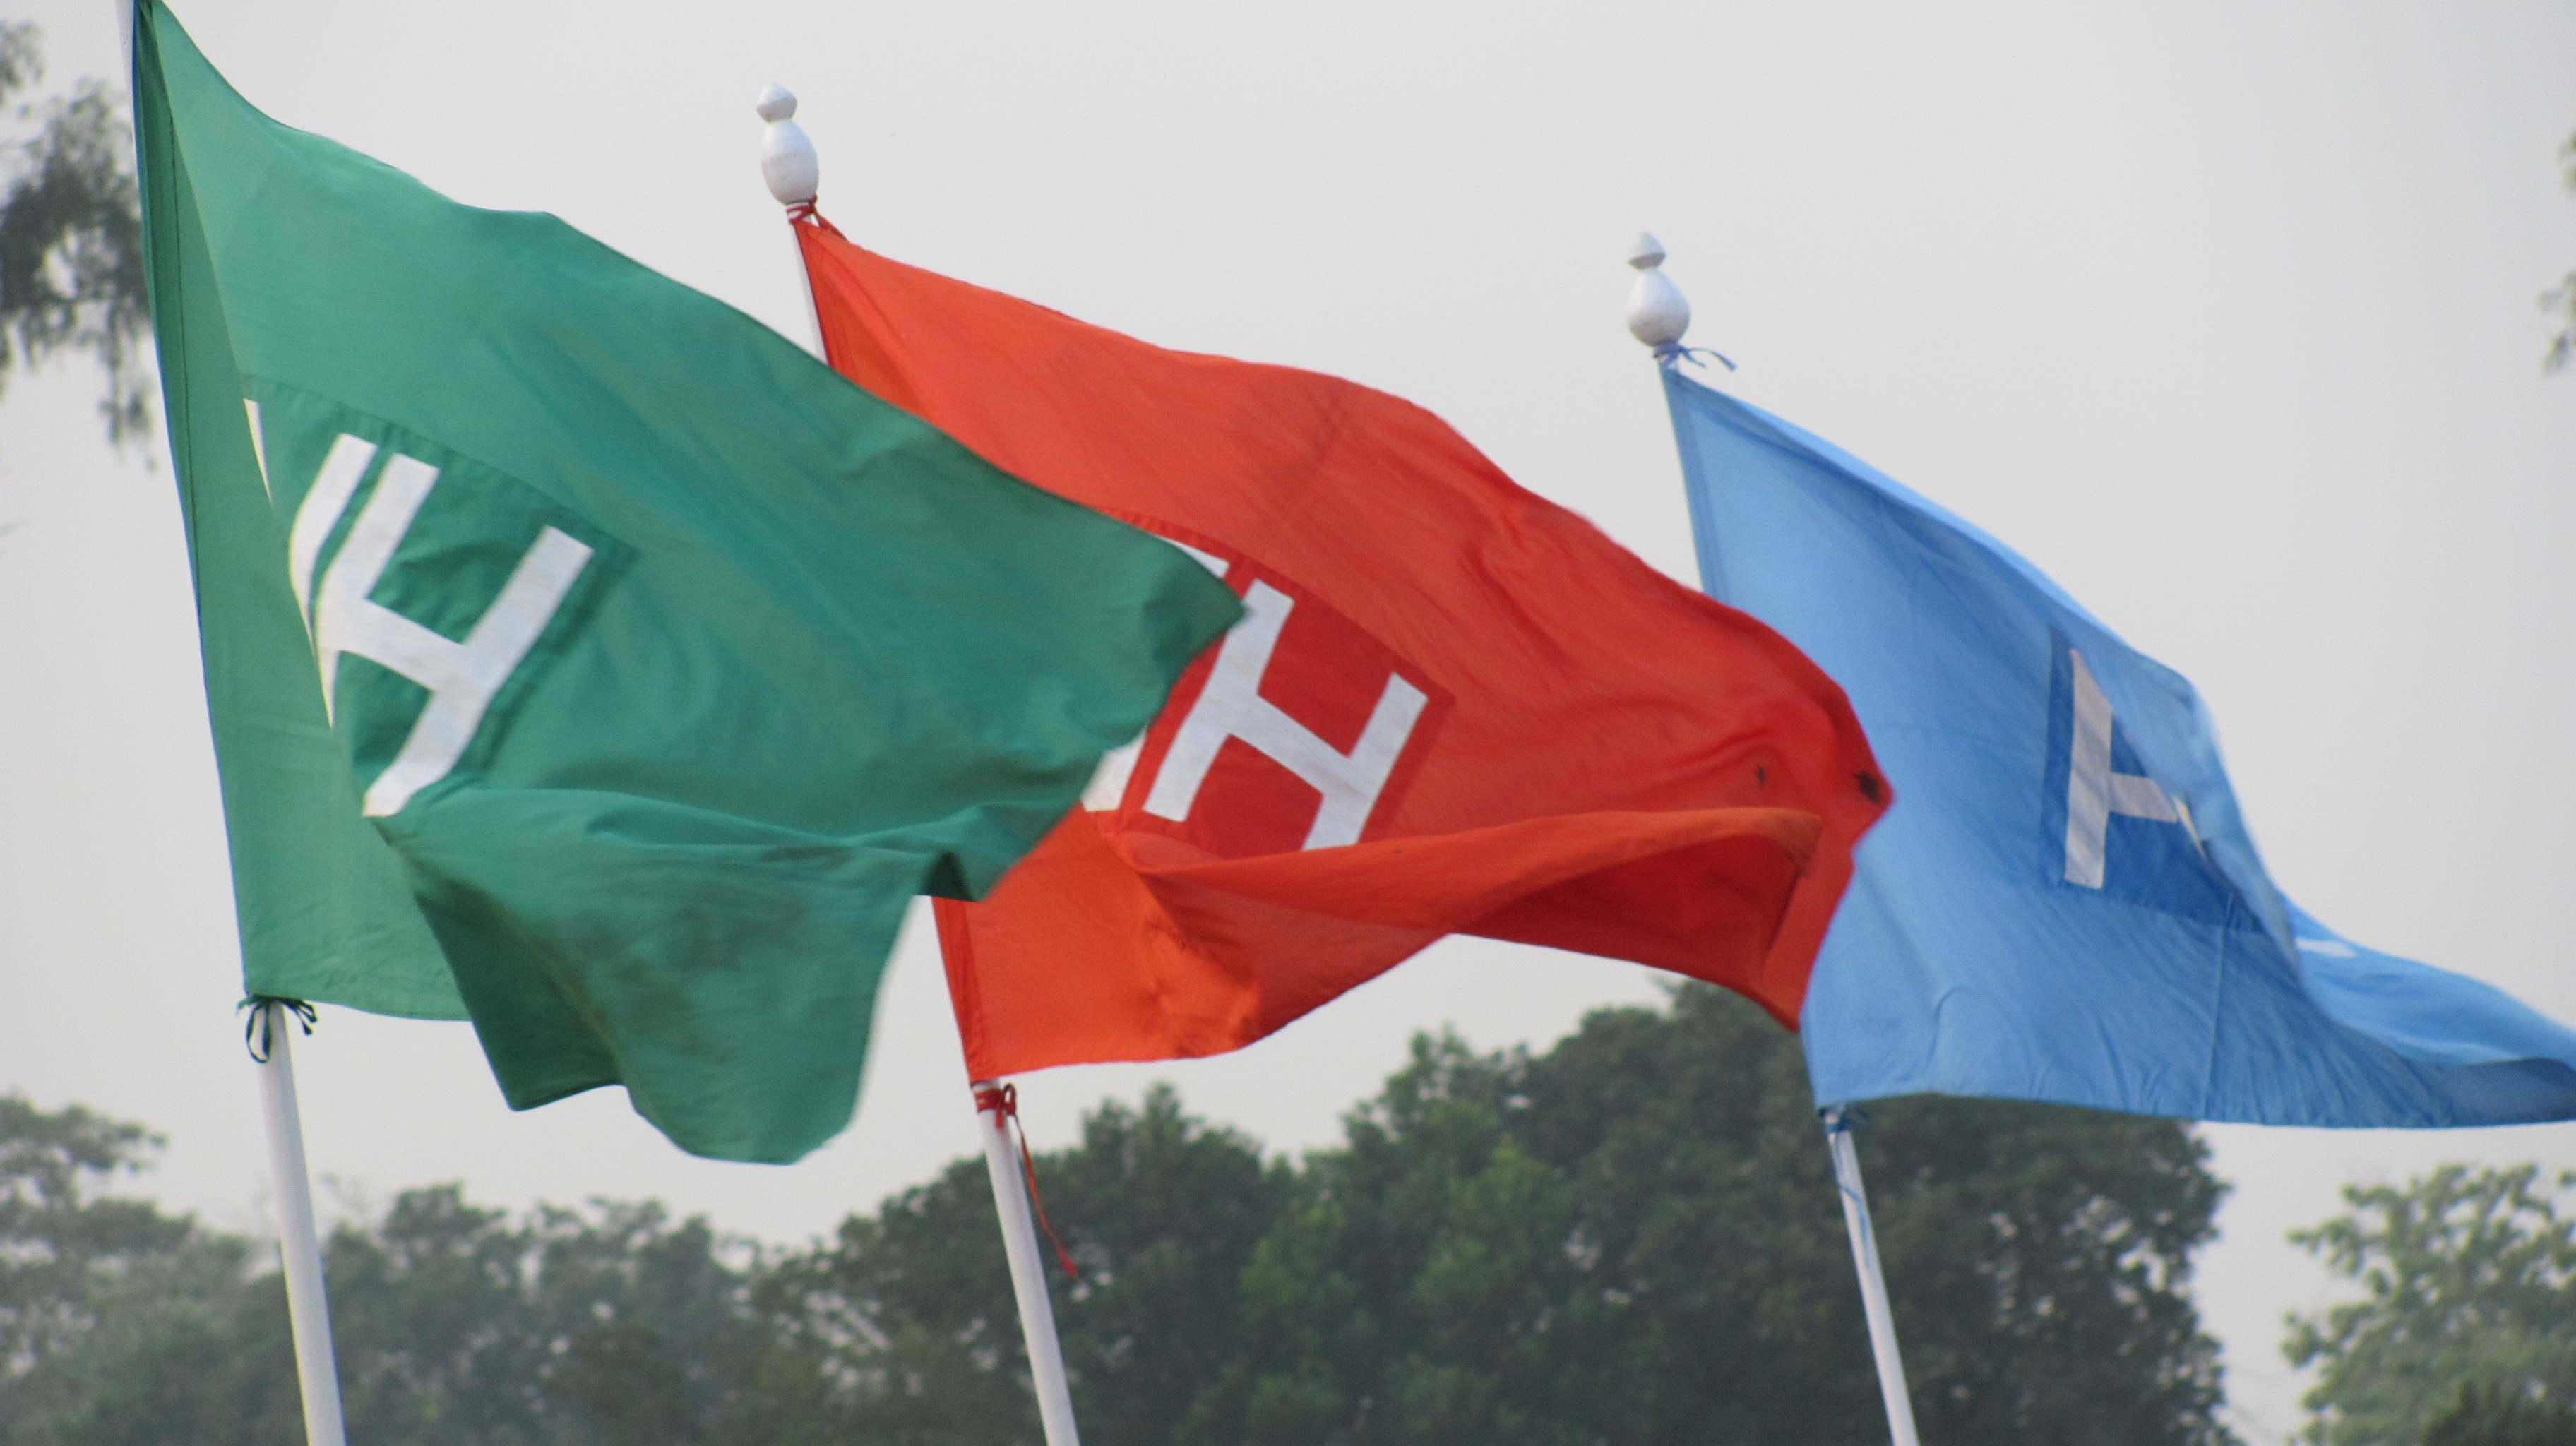 File:MCC house flags.JPG - Wikimedia Commons